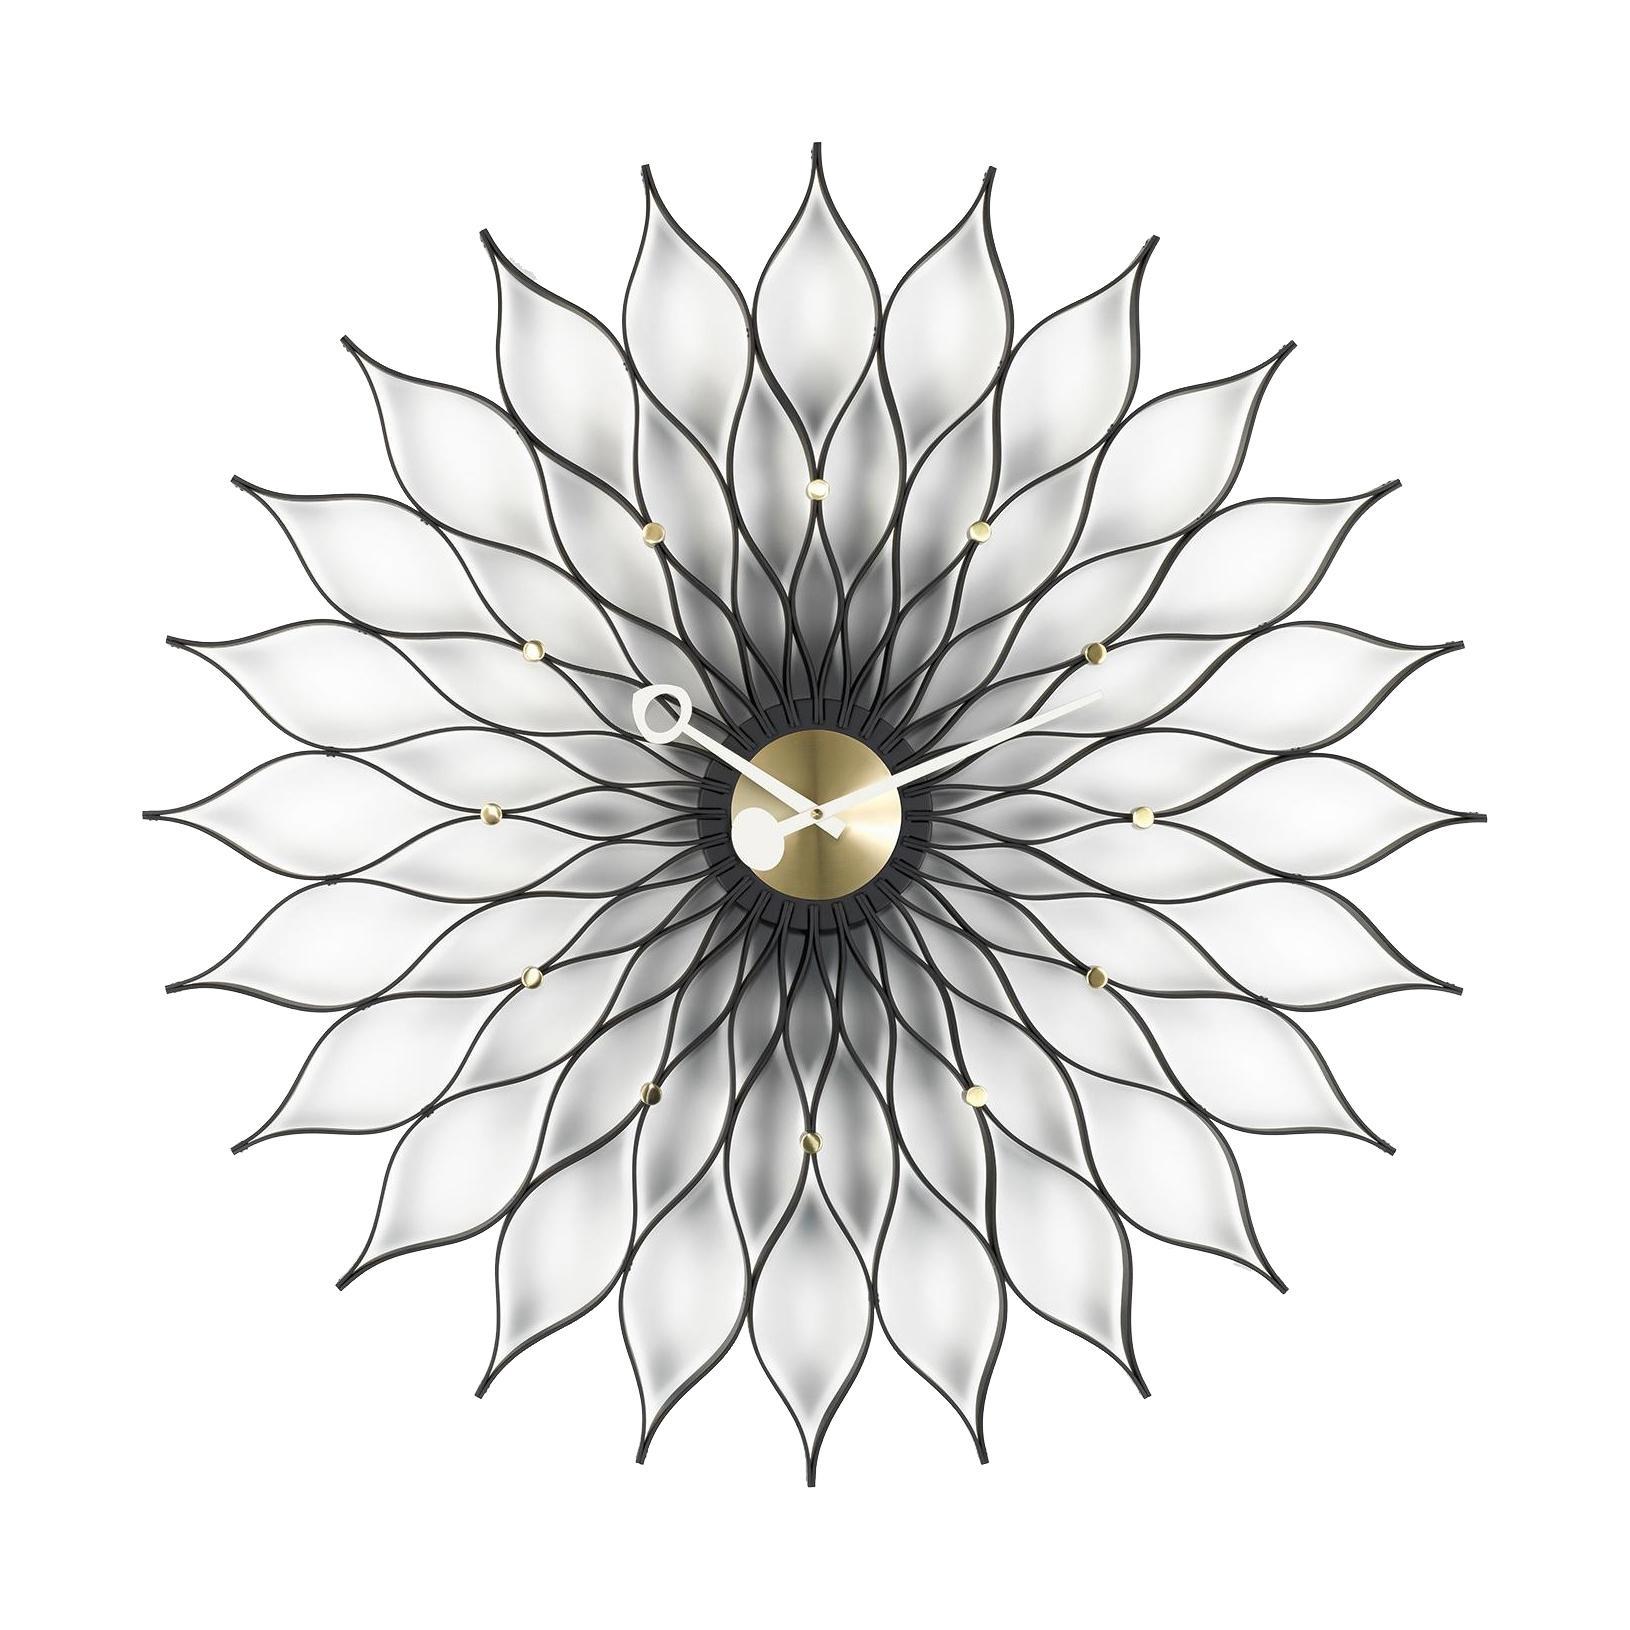 Vitra - Sunflower Clock Nelson Wanduhr - messing/schwarz/Ø75cm/Quarz-Uhrwerk | Dekoration > Uhren > Wanduhren | Vitra